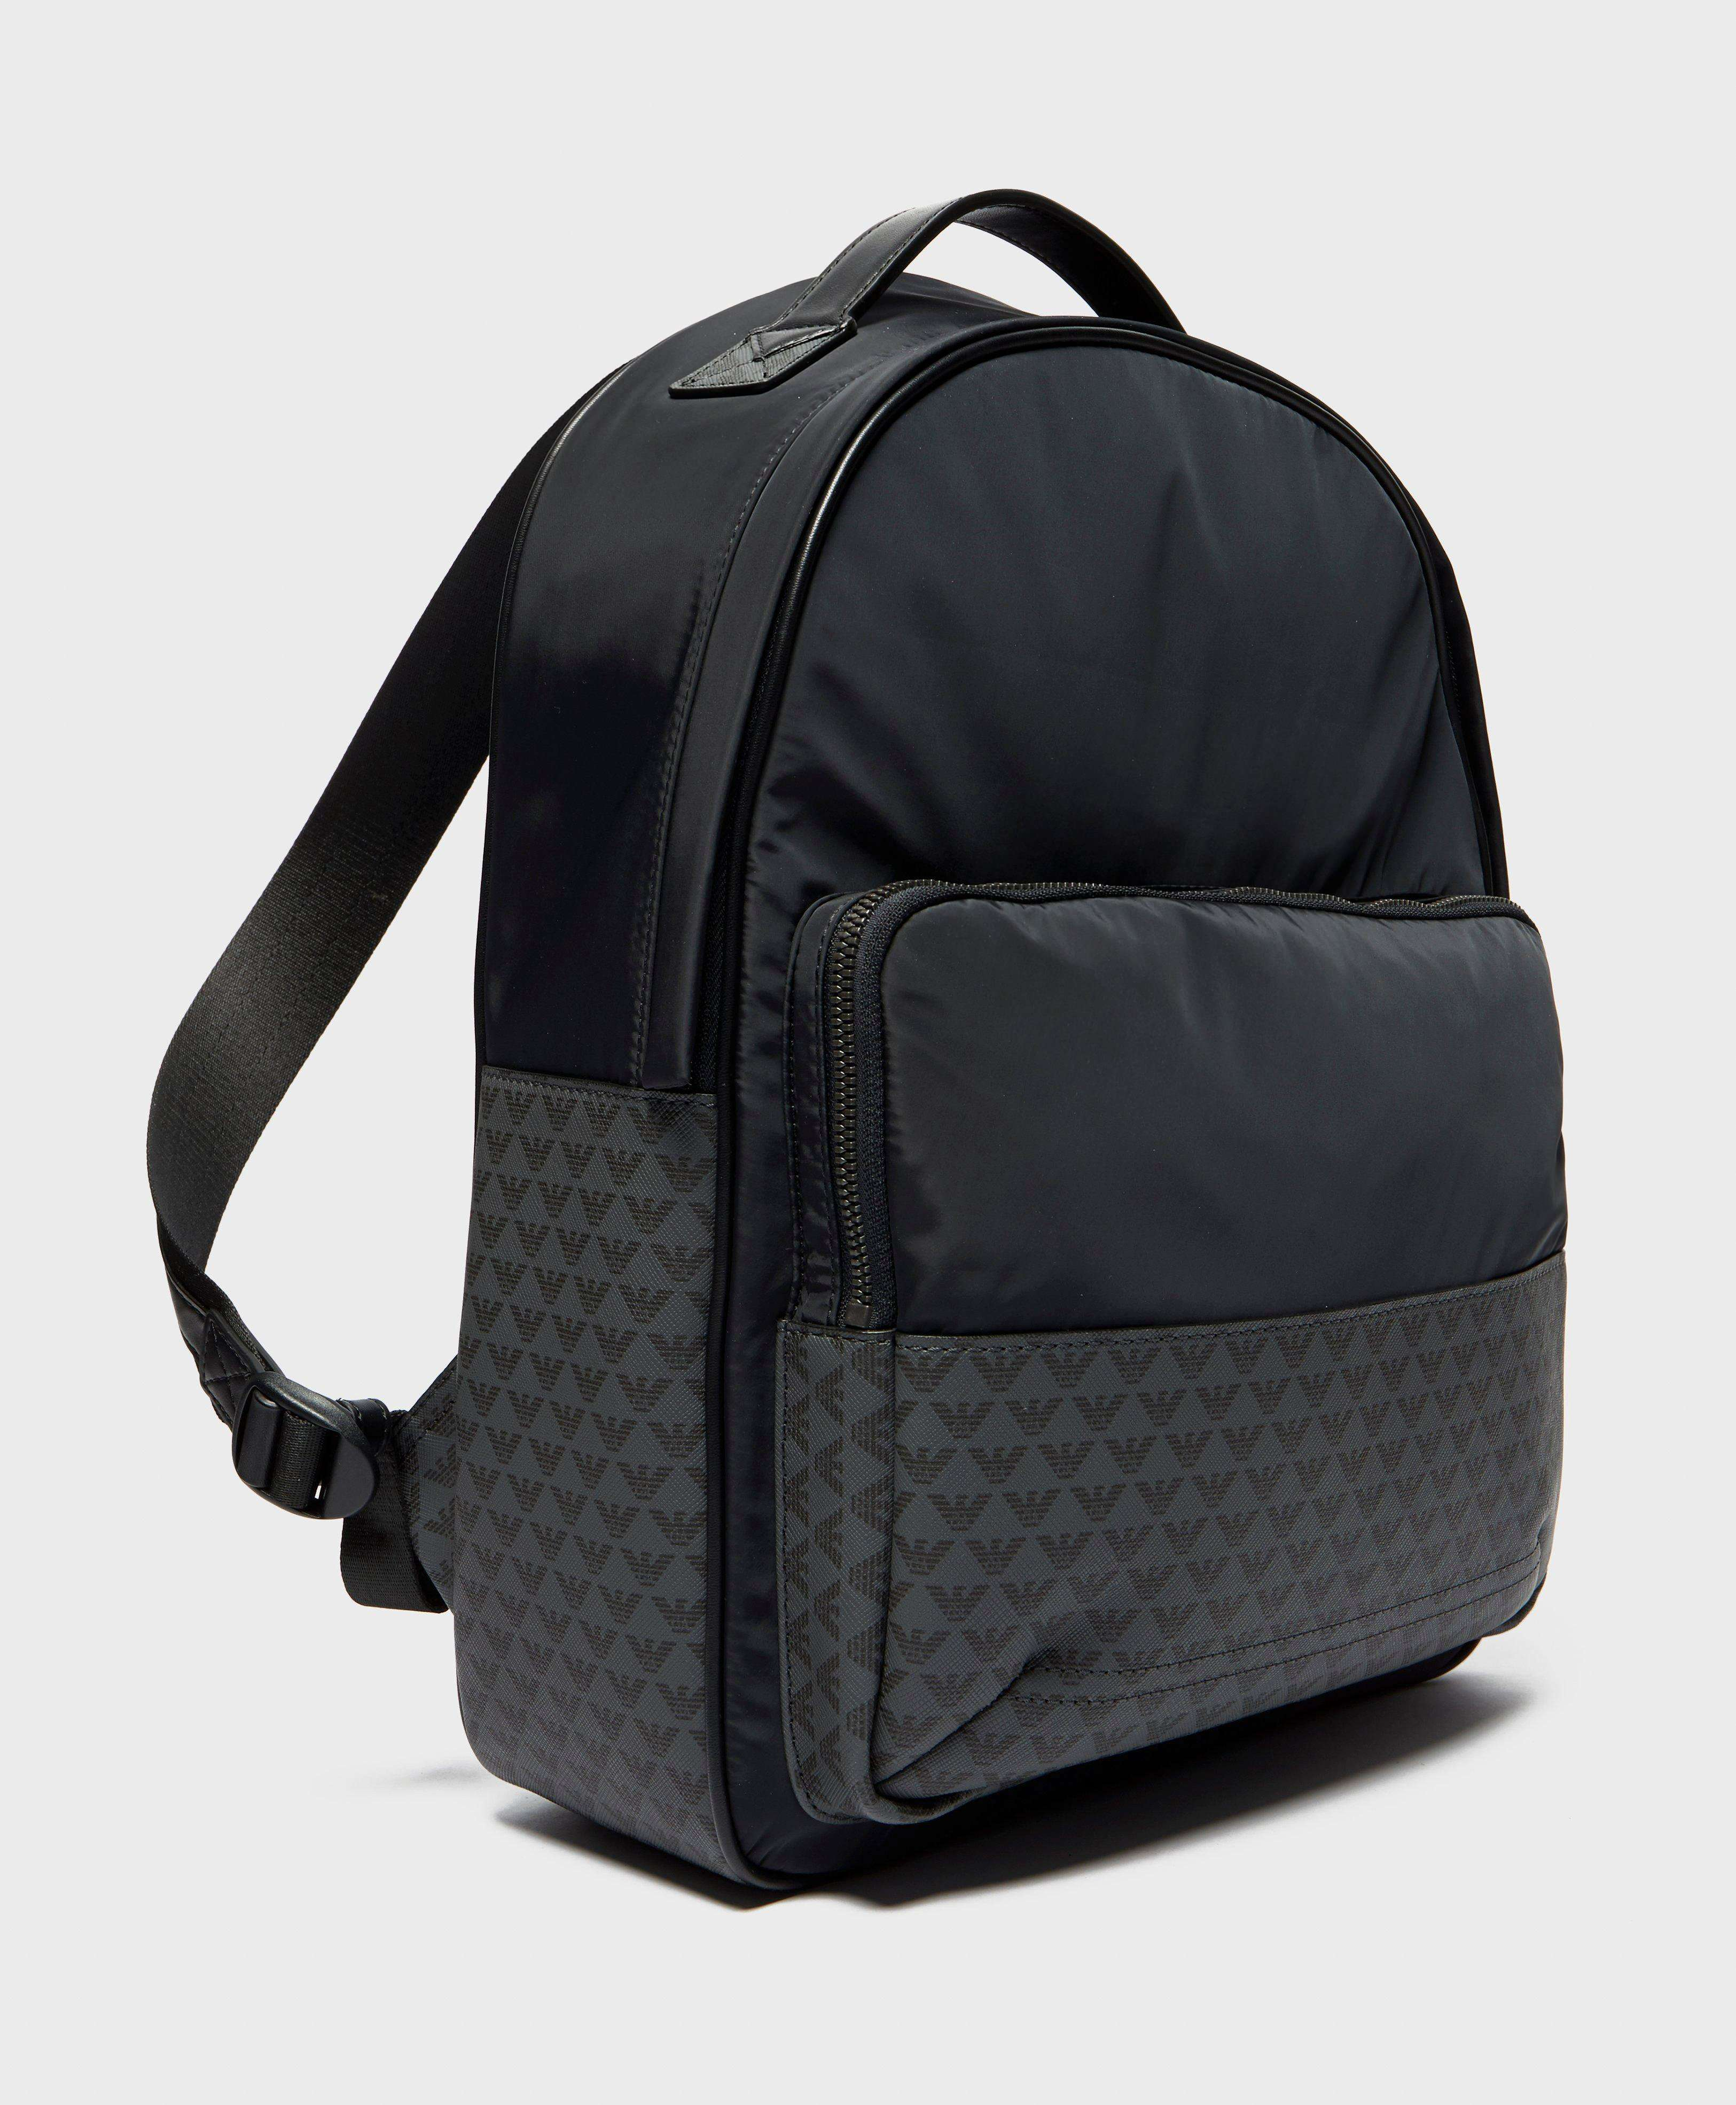 Emporio Armani Nylon Backpack